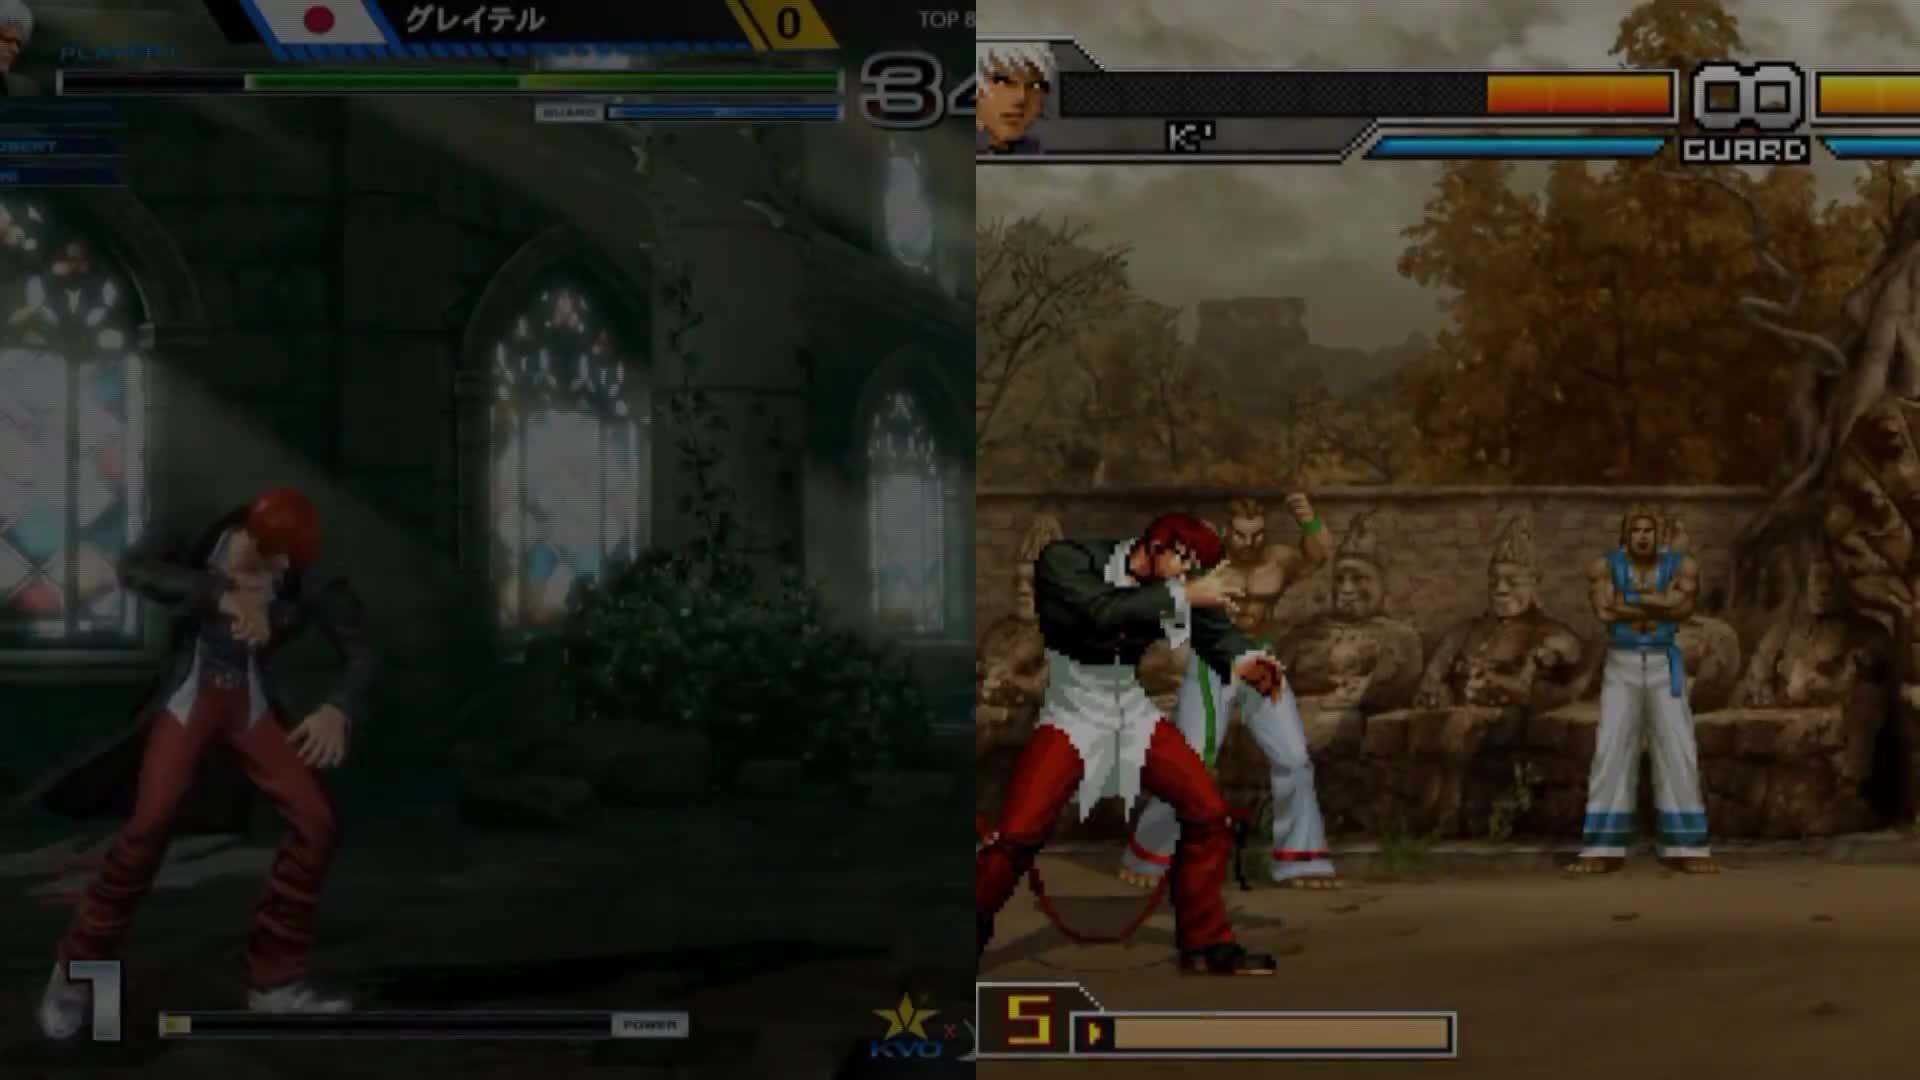 kof xiv comparision, kof xiv vs kof 2002, the king of fighters xiv comparision, KOF XIV COMPARISON WITH KOF 2002, XIII and WING GIFs